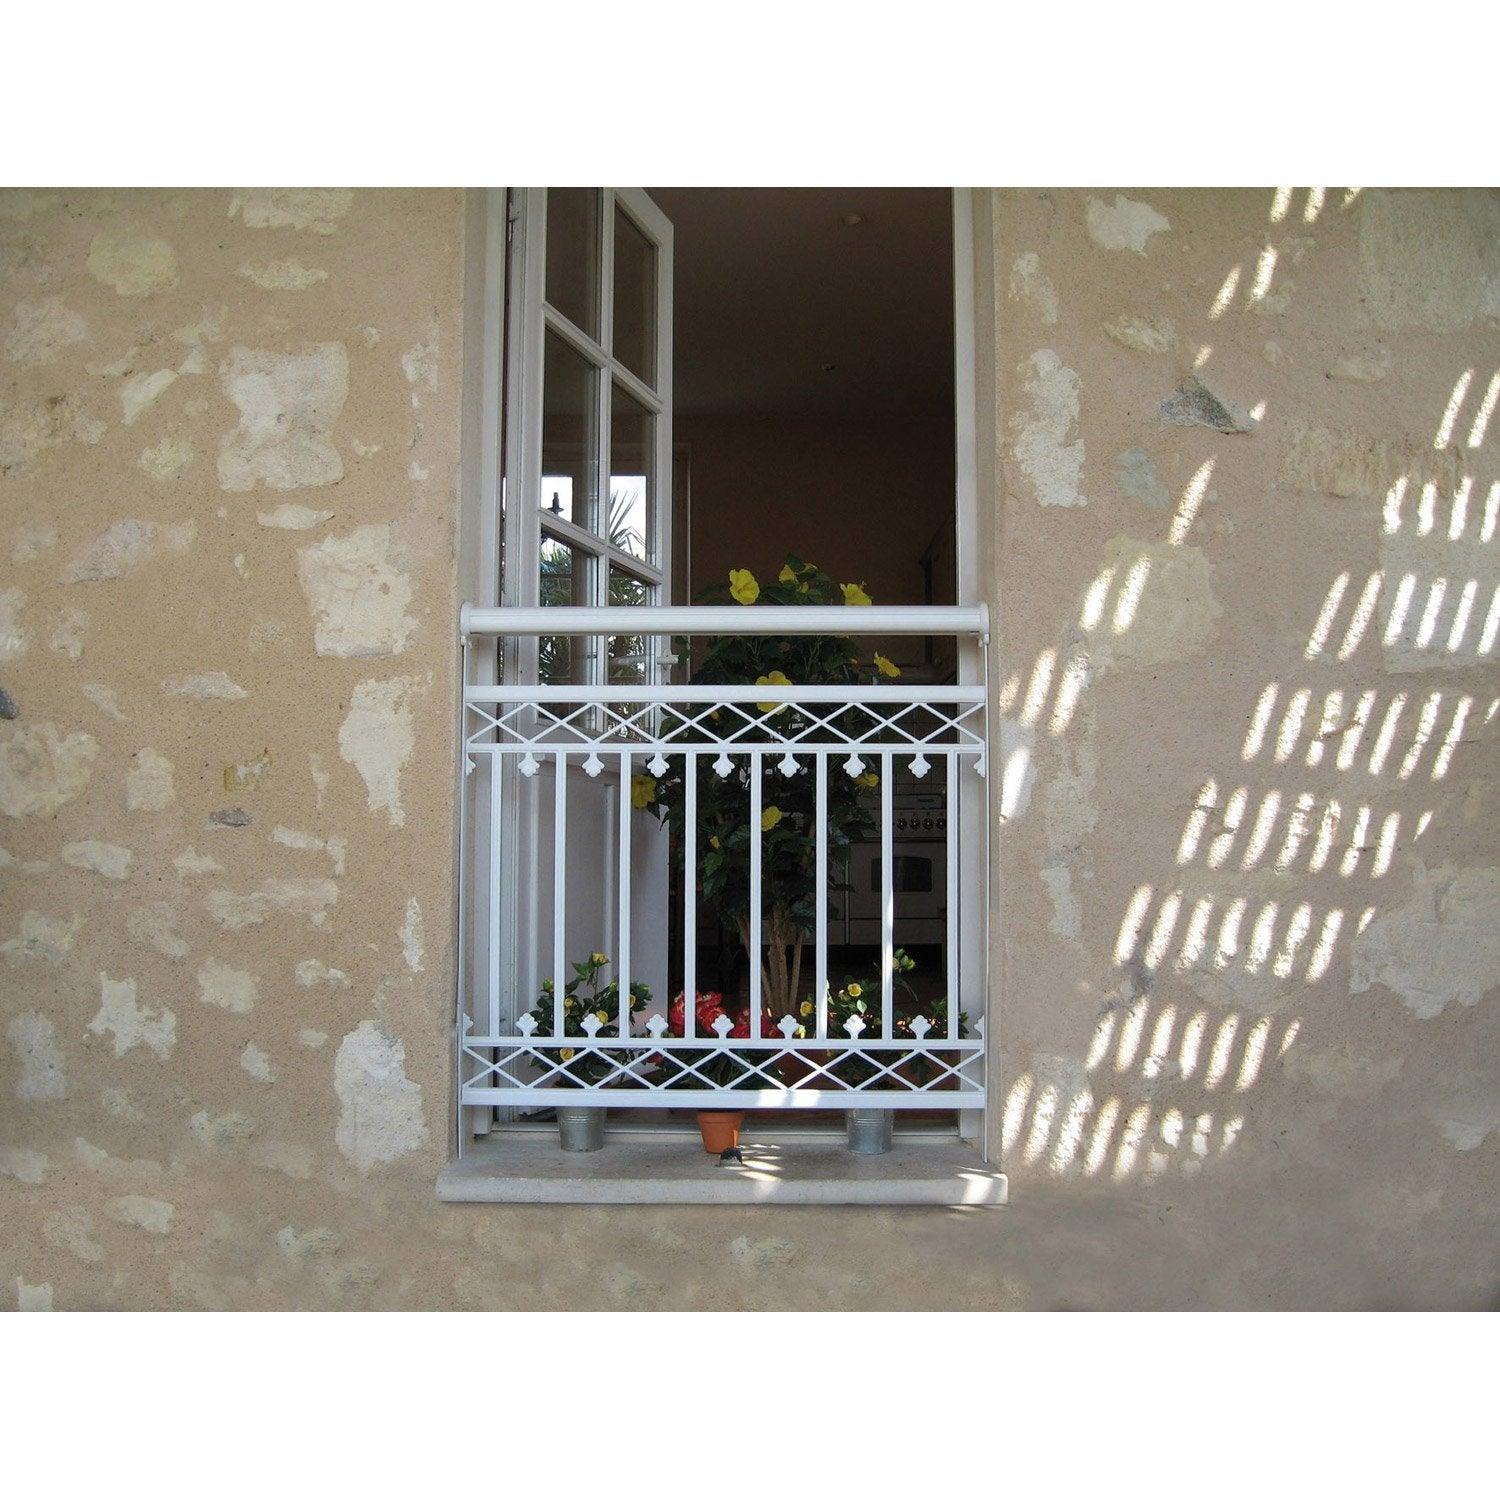 garde corps pour balconnet en aluminium laqu arizona. Black Bedroom Furniture Sets. Home Design Ideas